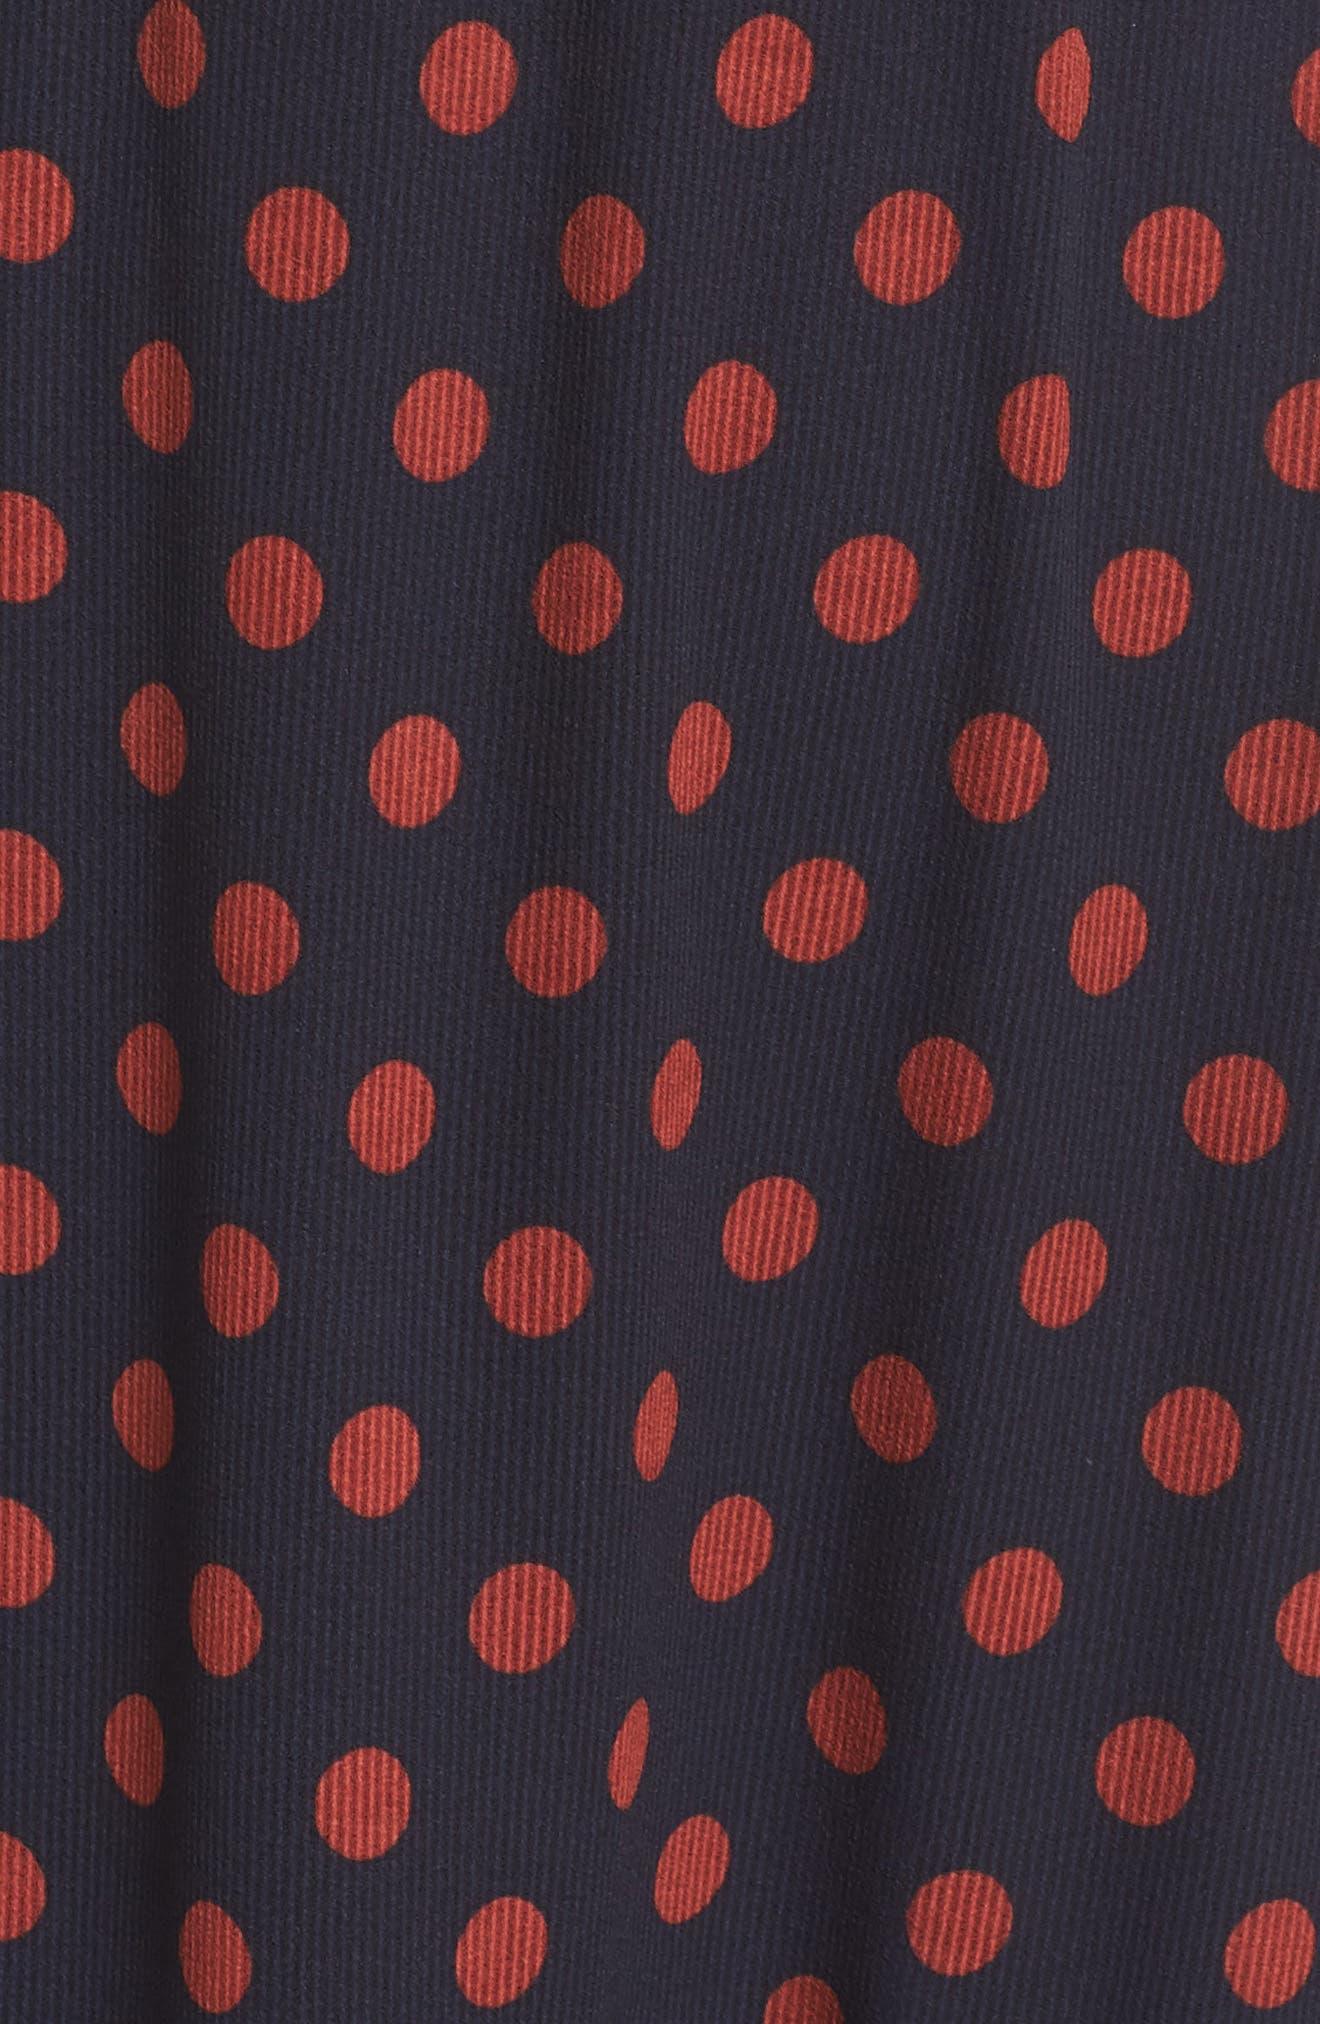 Dot Ruffle Maxi Dress,                             Alternate thumbnail 5, color,                             Navy/ Rust